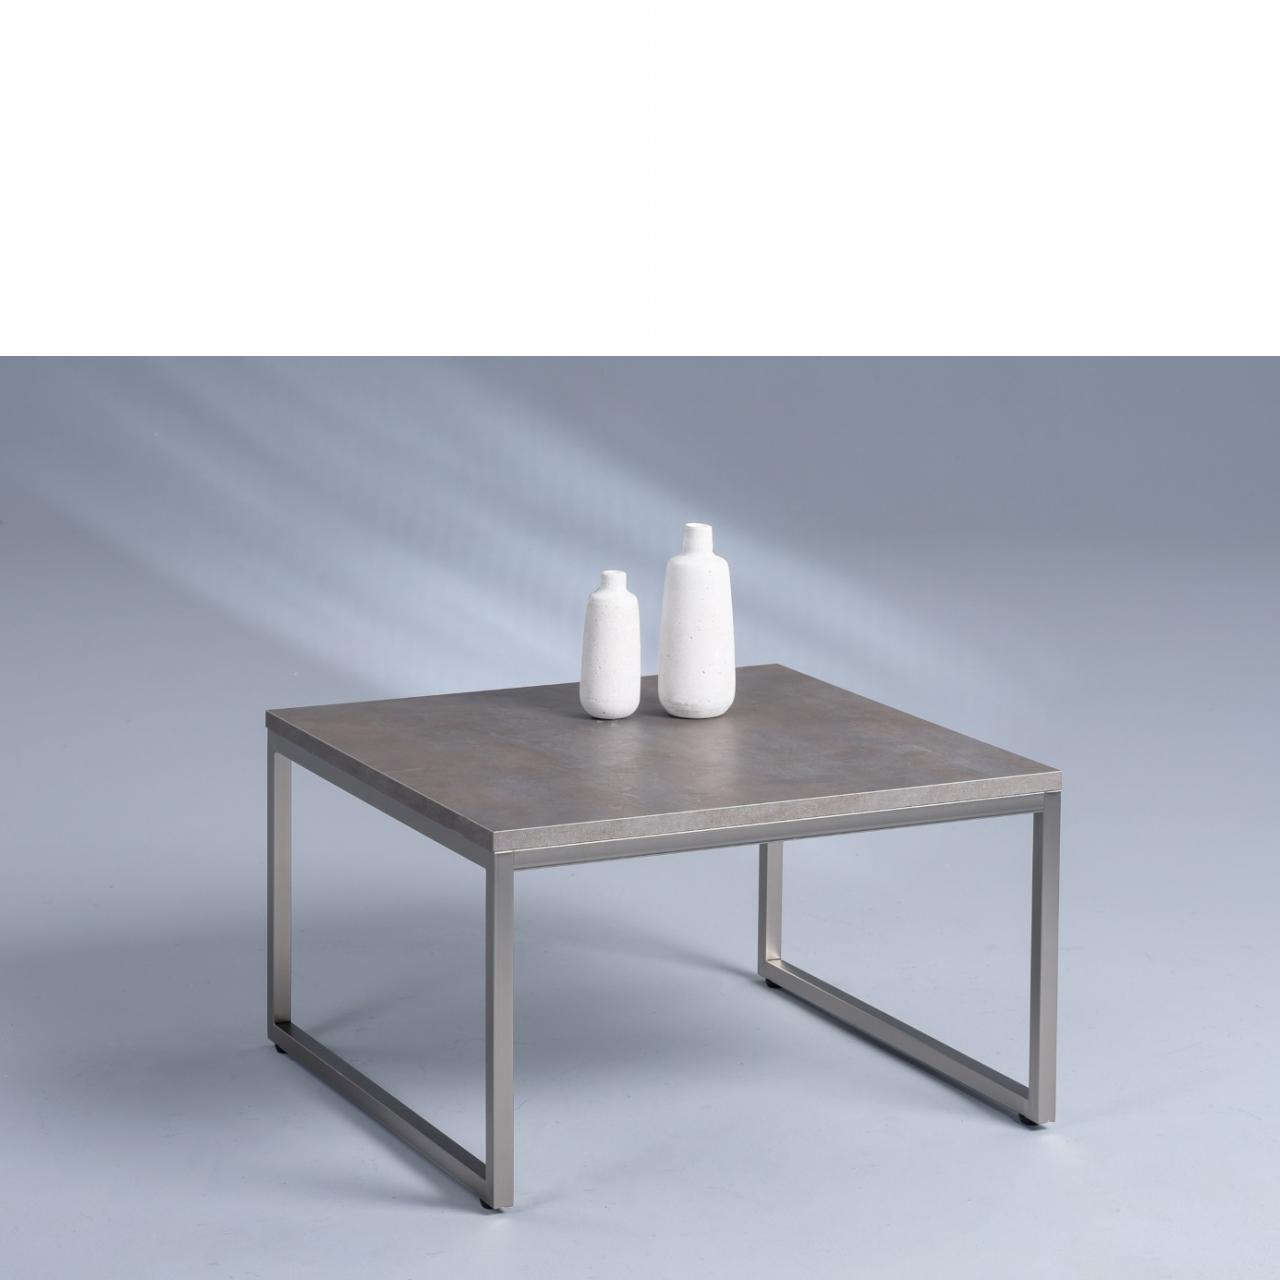 Couchtisch Lagos 1 Keramik Edelstahloptik Mdf Metall 60x60 Cm